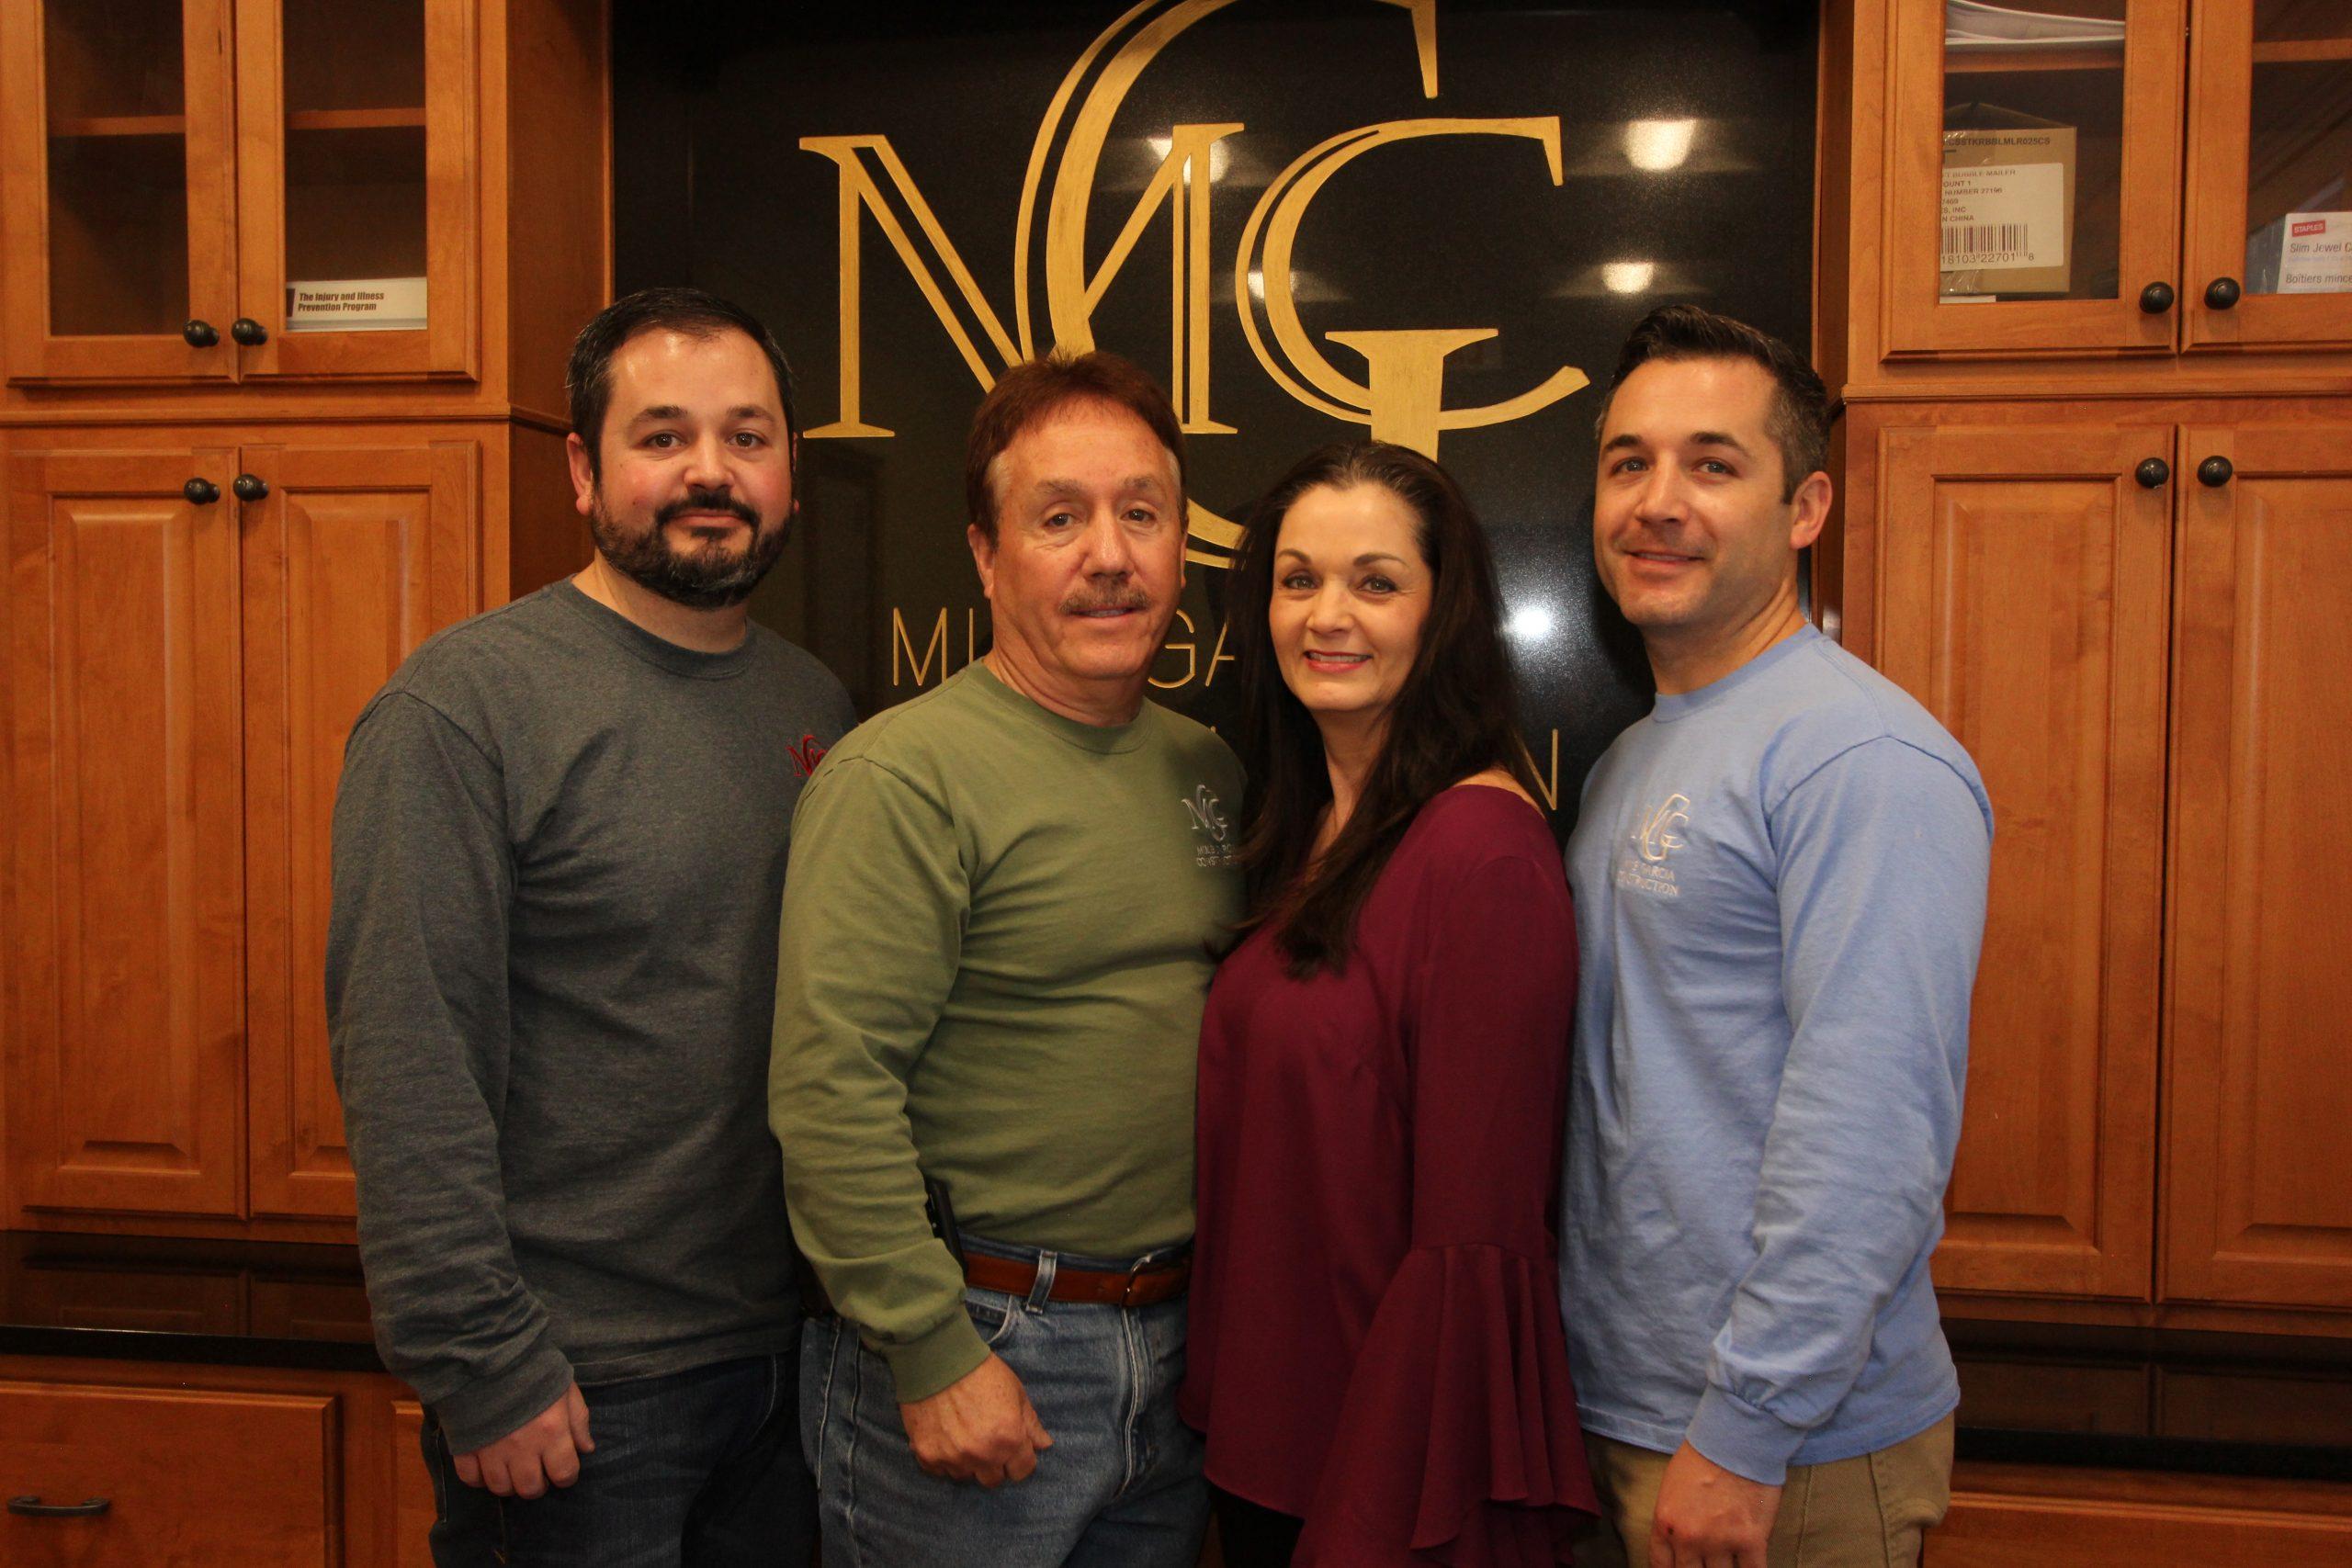 Garcia family, Mike Garcia Construction